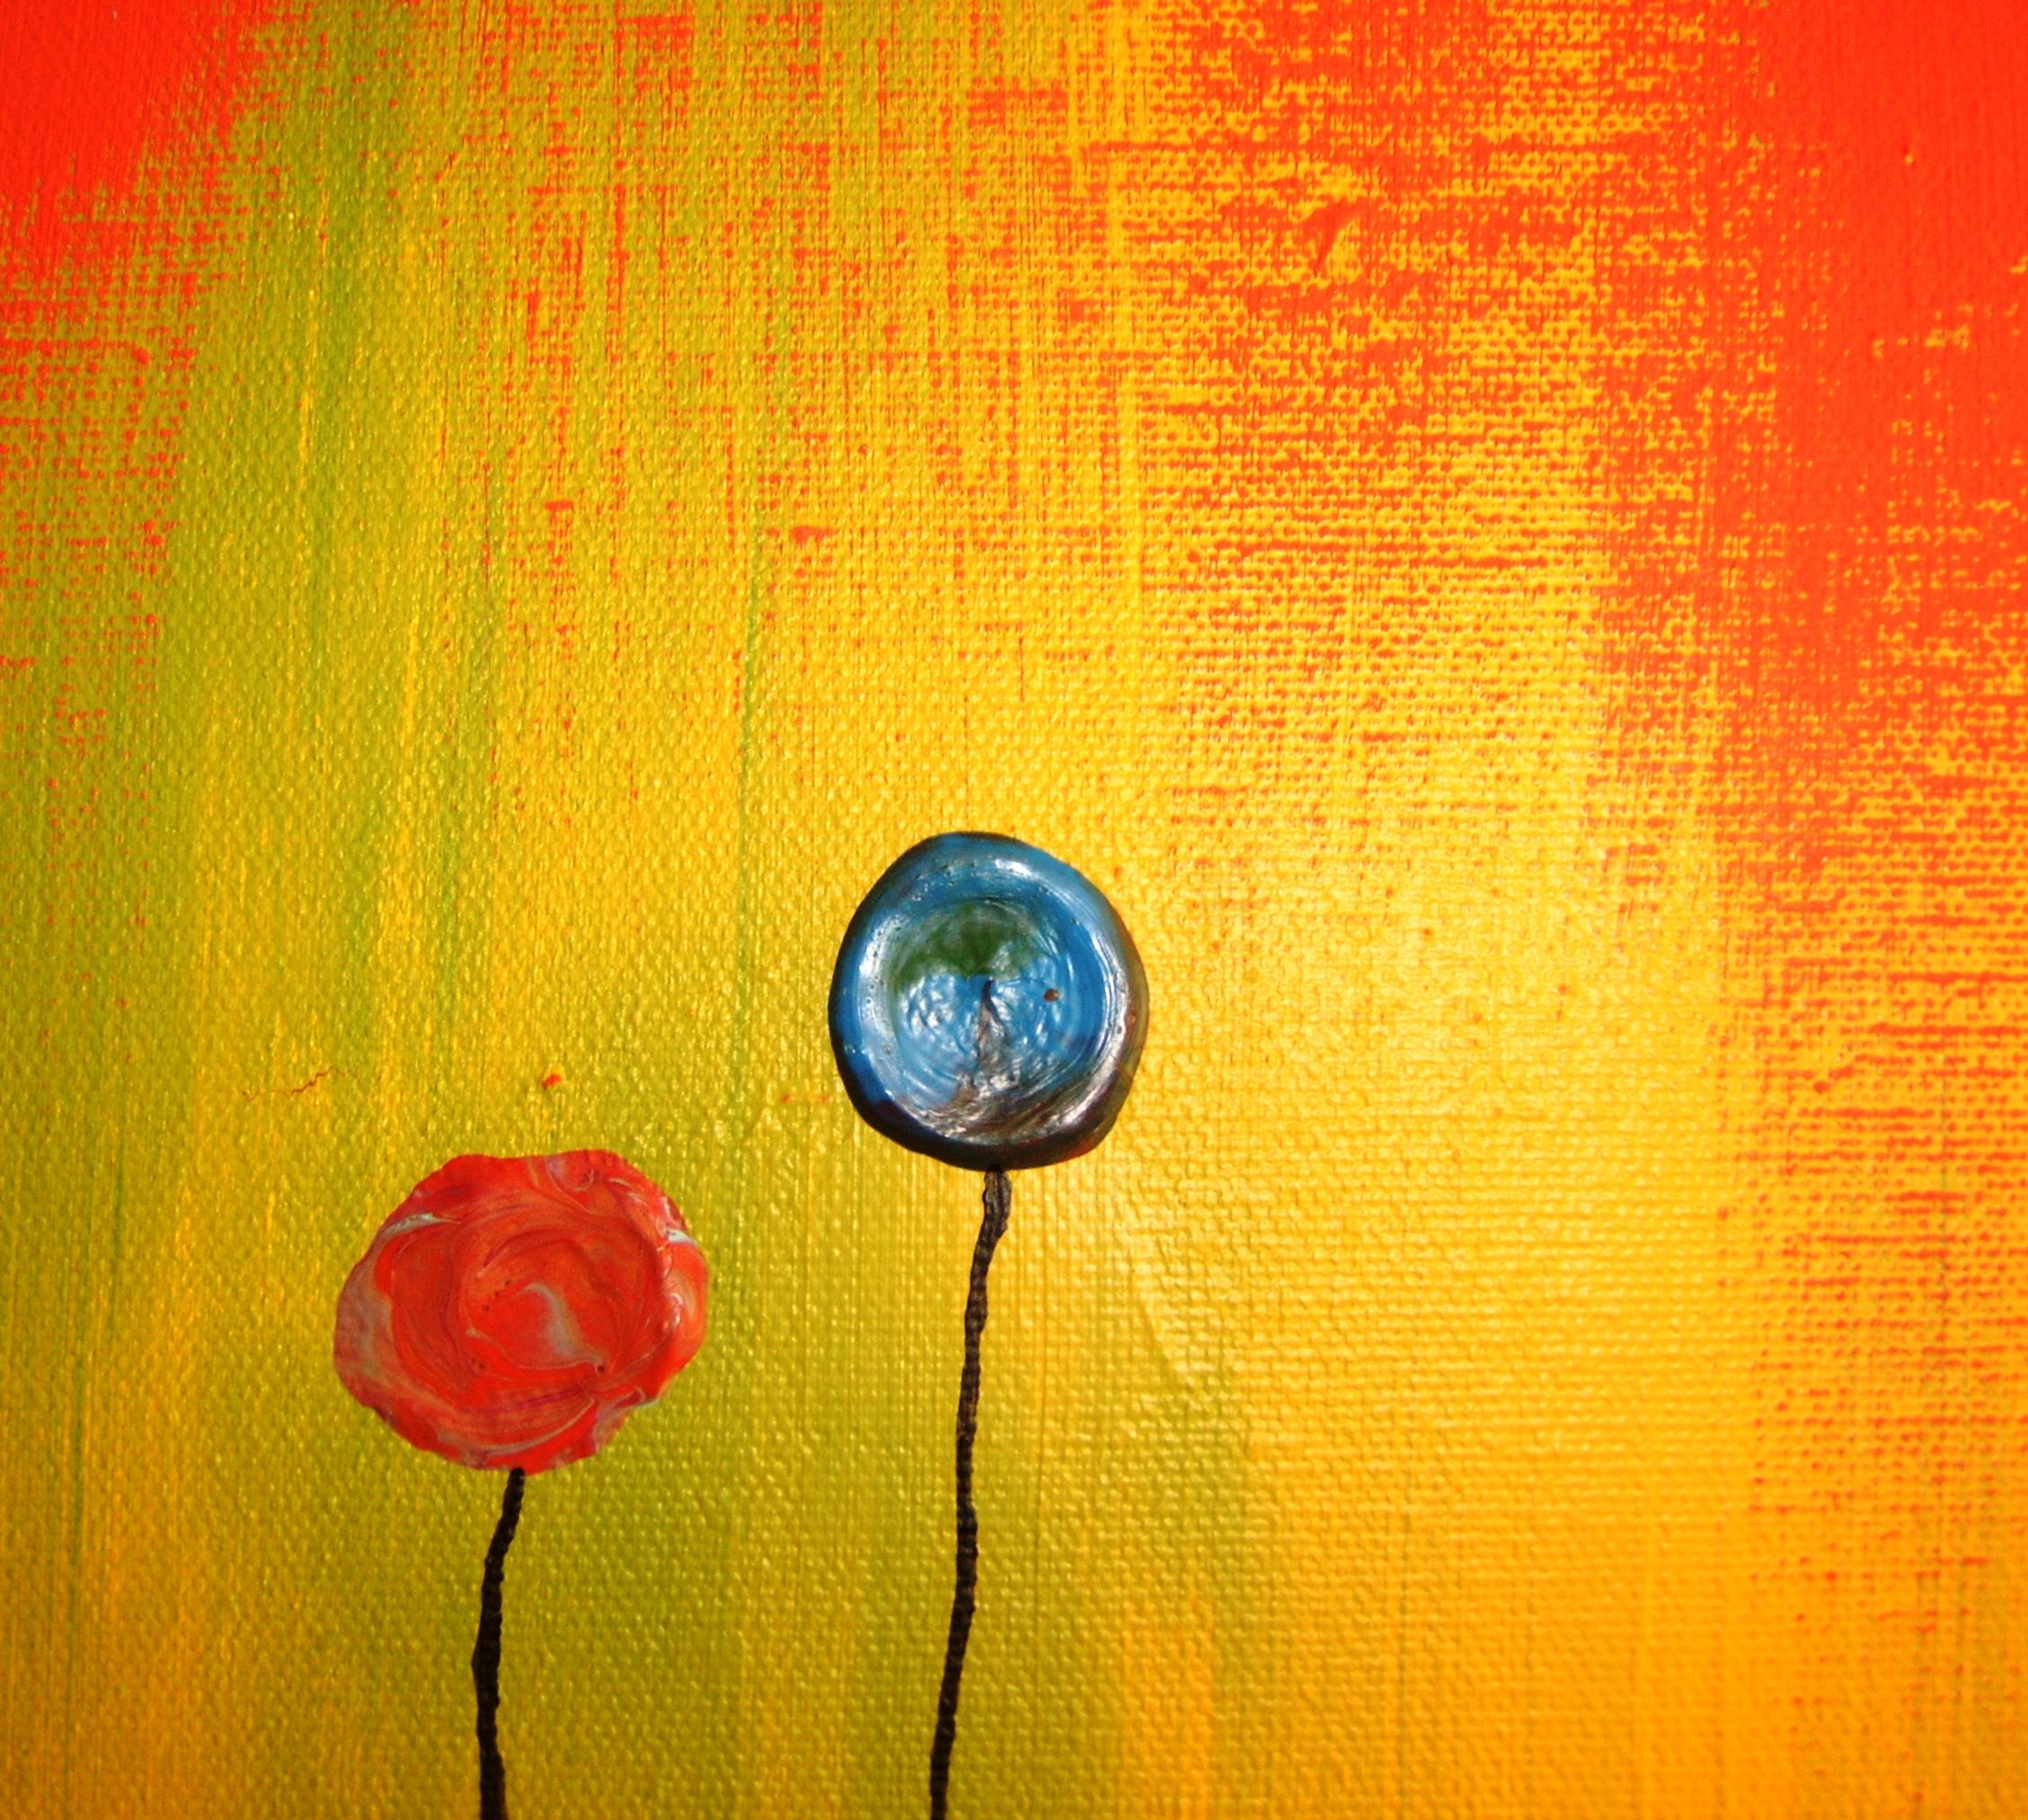 Chrissy Costanza Iphone Wallpaper Poppy Field Abstract Art Zachary Brown Art Wallsev Com